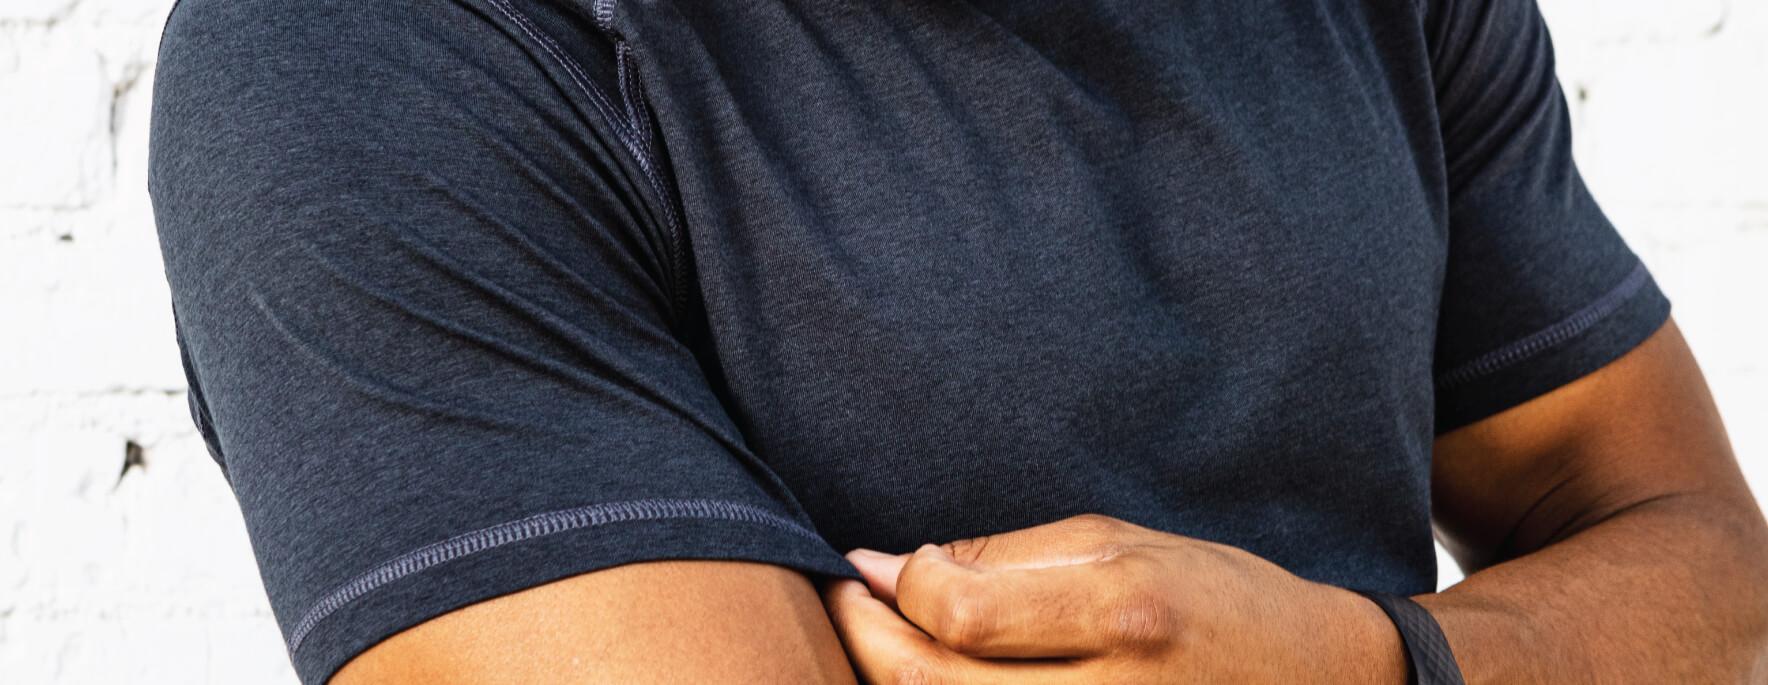 Men's Short Sleeve Shirts - tasc Performance